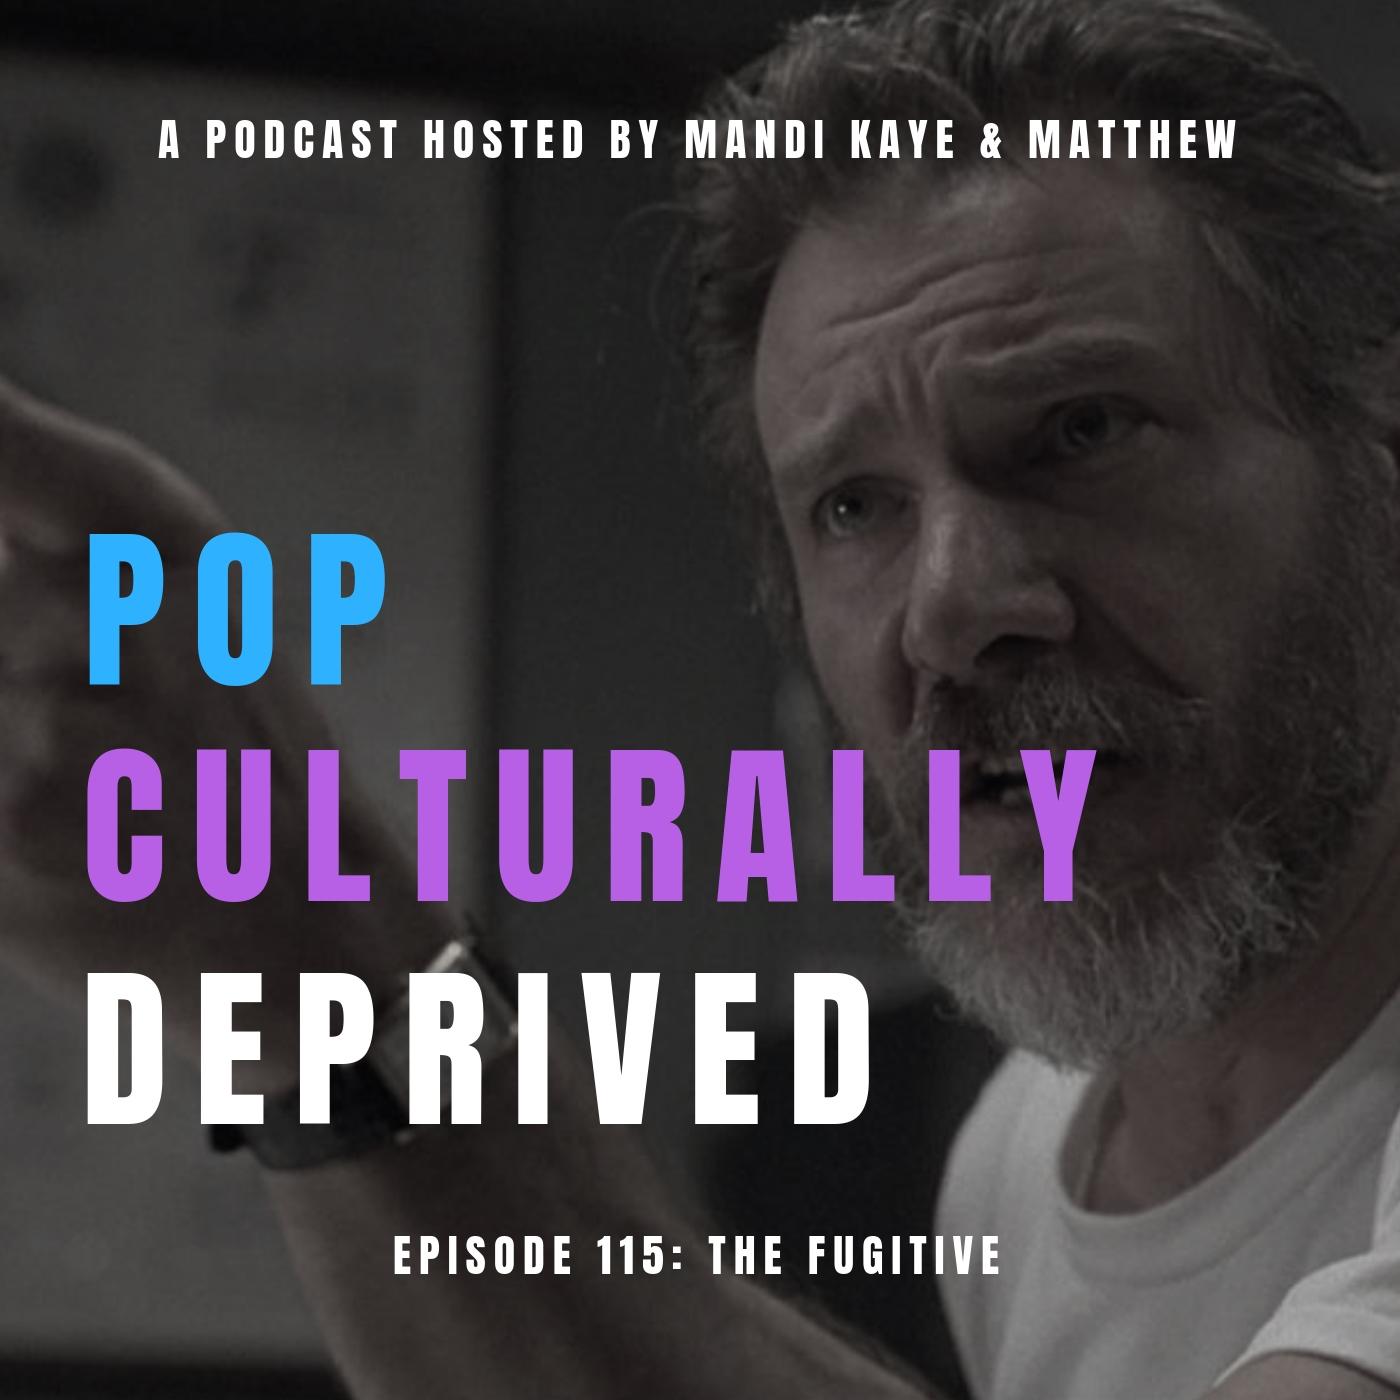 Pop Culturally Deprived